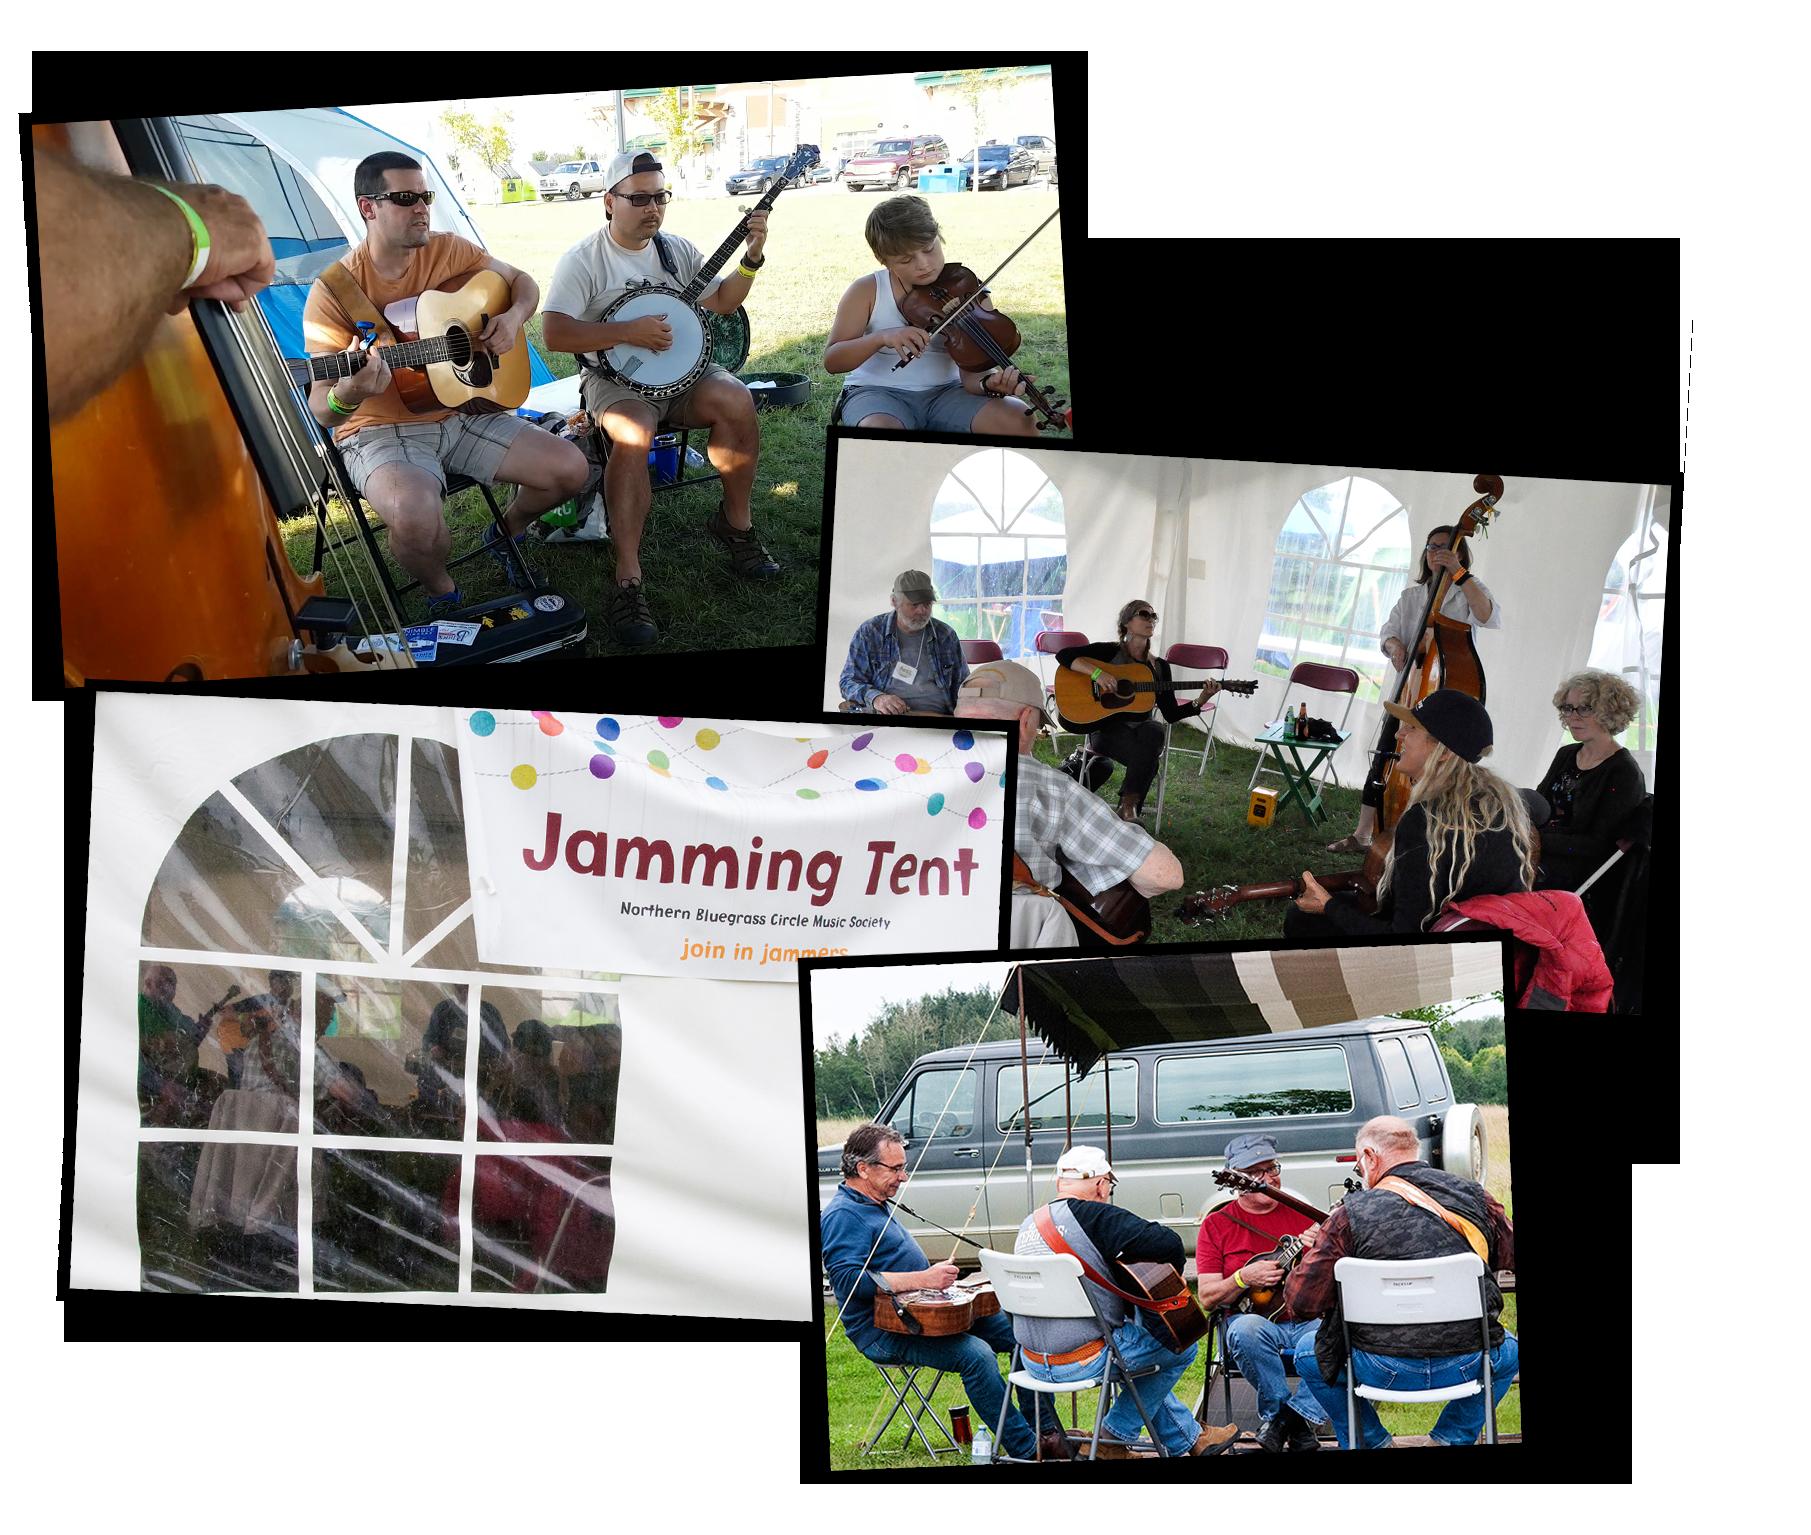 Blueberry Bluegrass Festival - Jamming